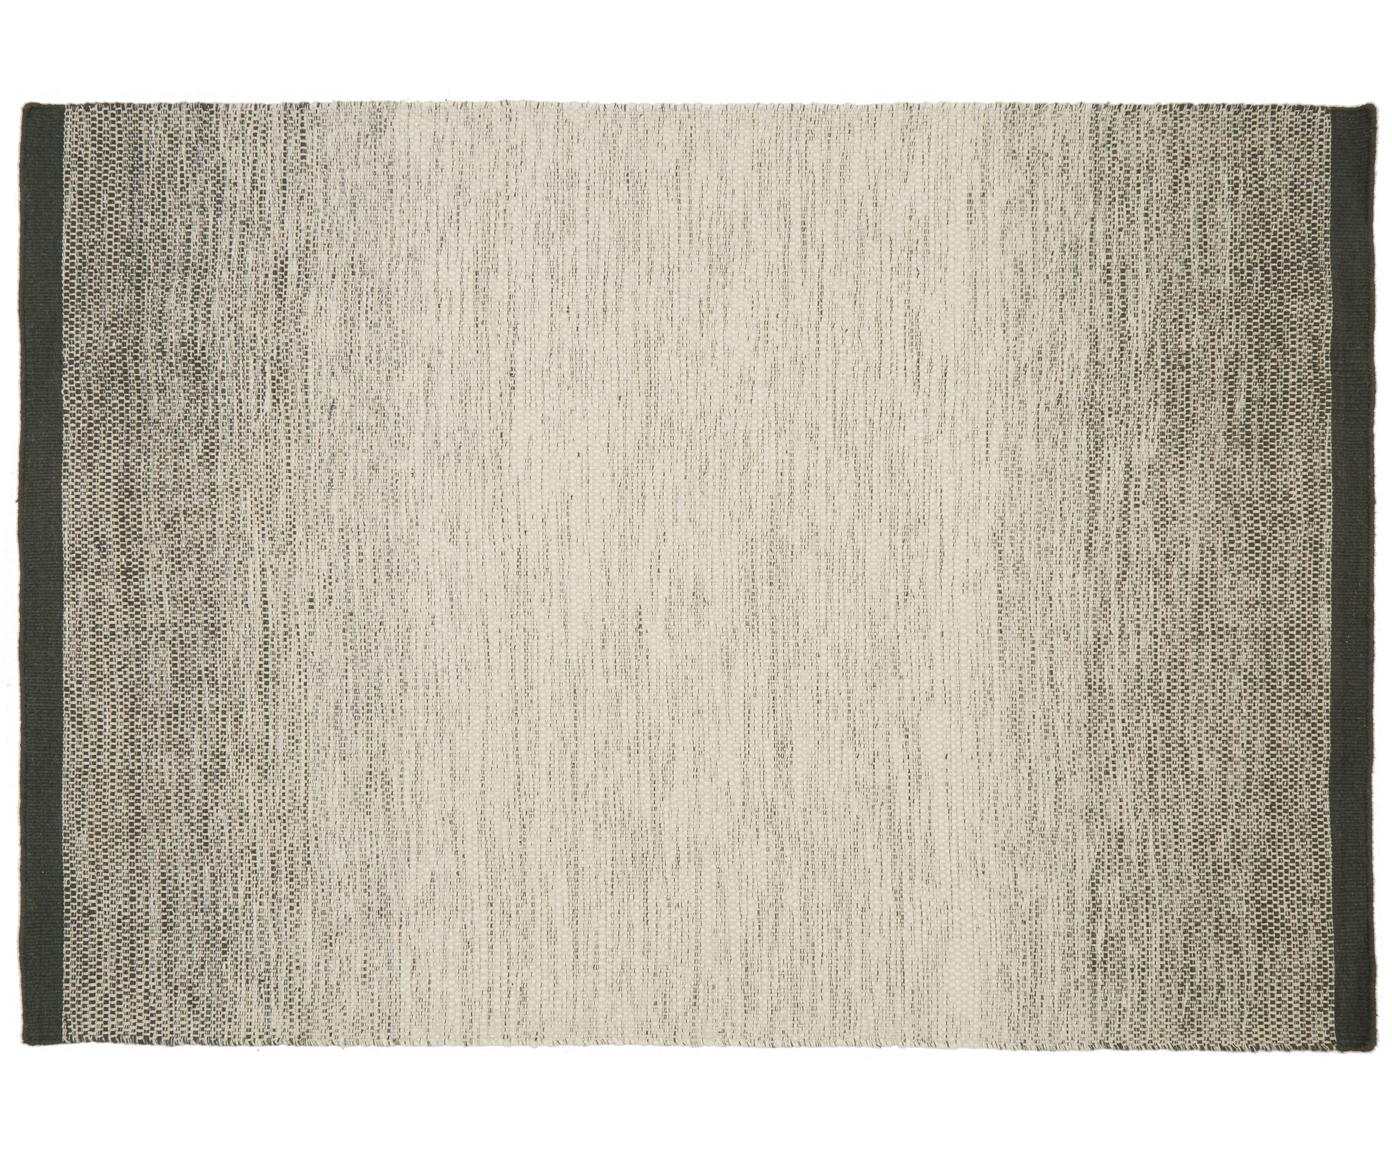 Alfombra artesanal de lana Lule, 70%lana, 30%algodón, Verde oscuro, beige, An 140 x L 200 cm (Tamaño S)